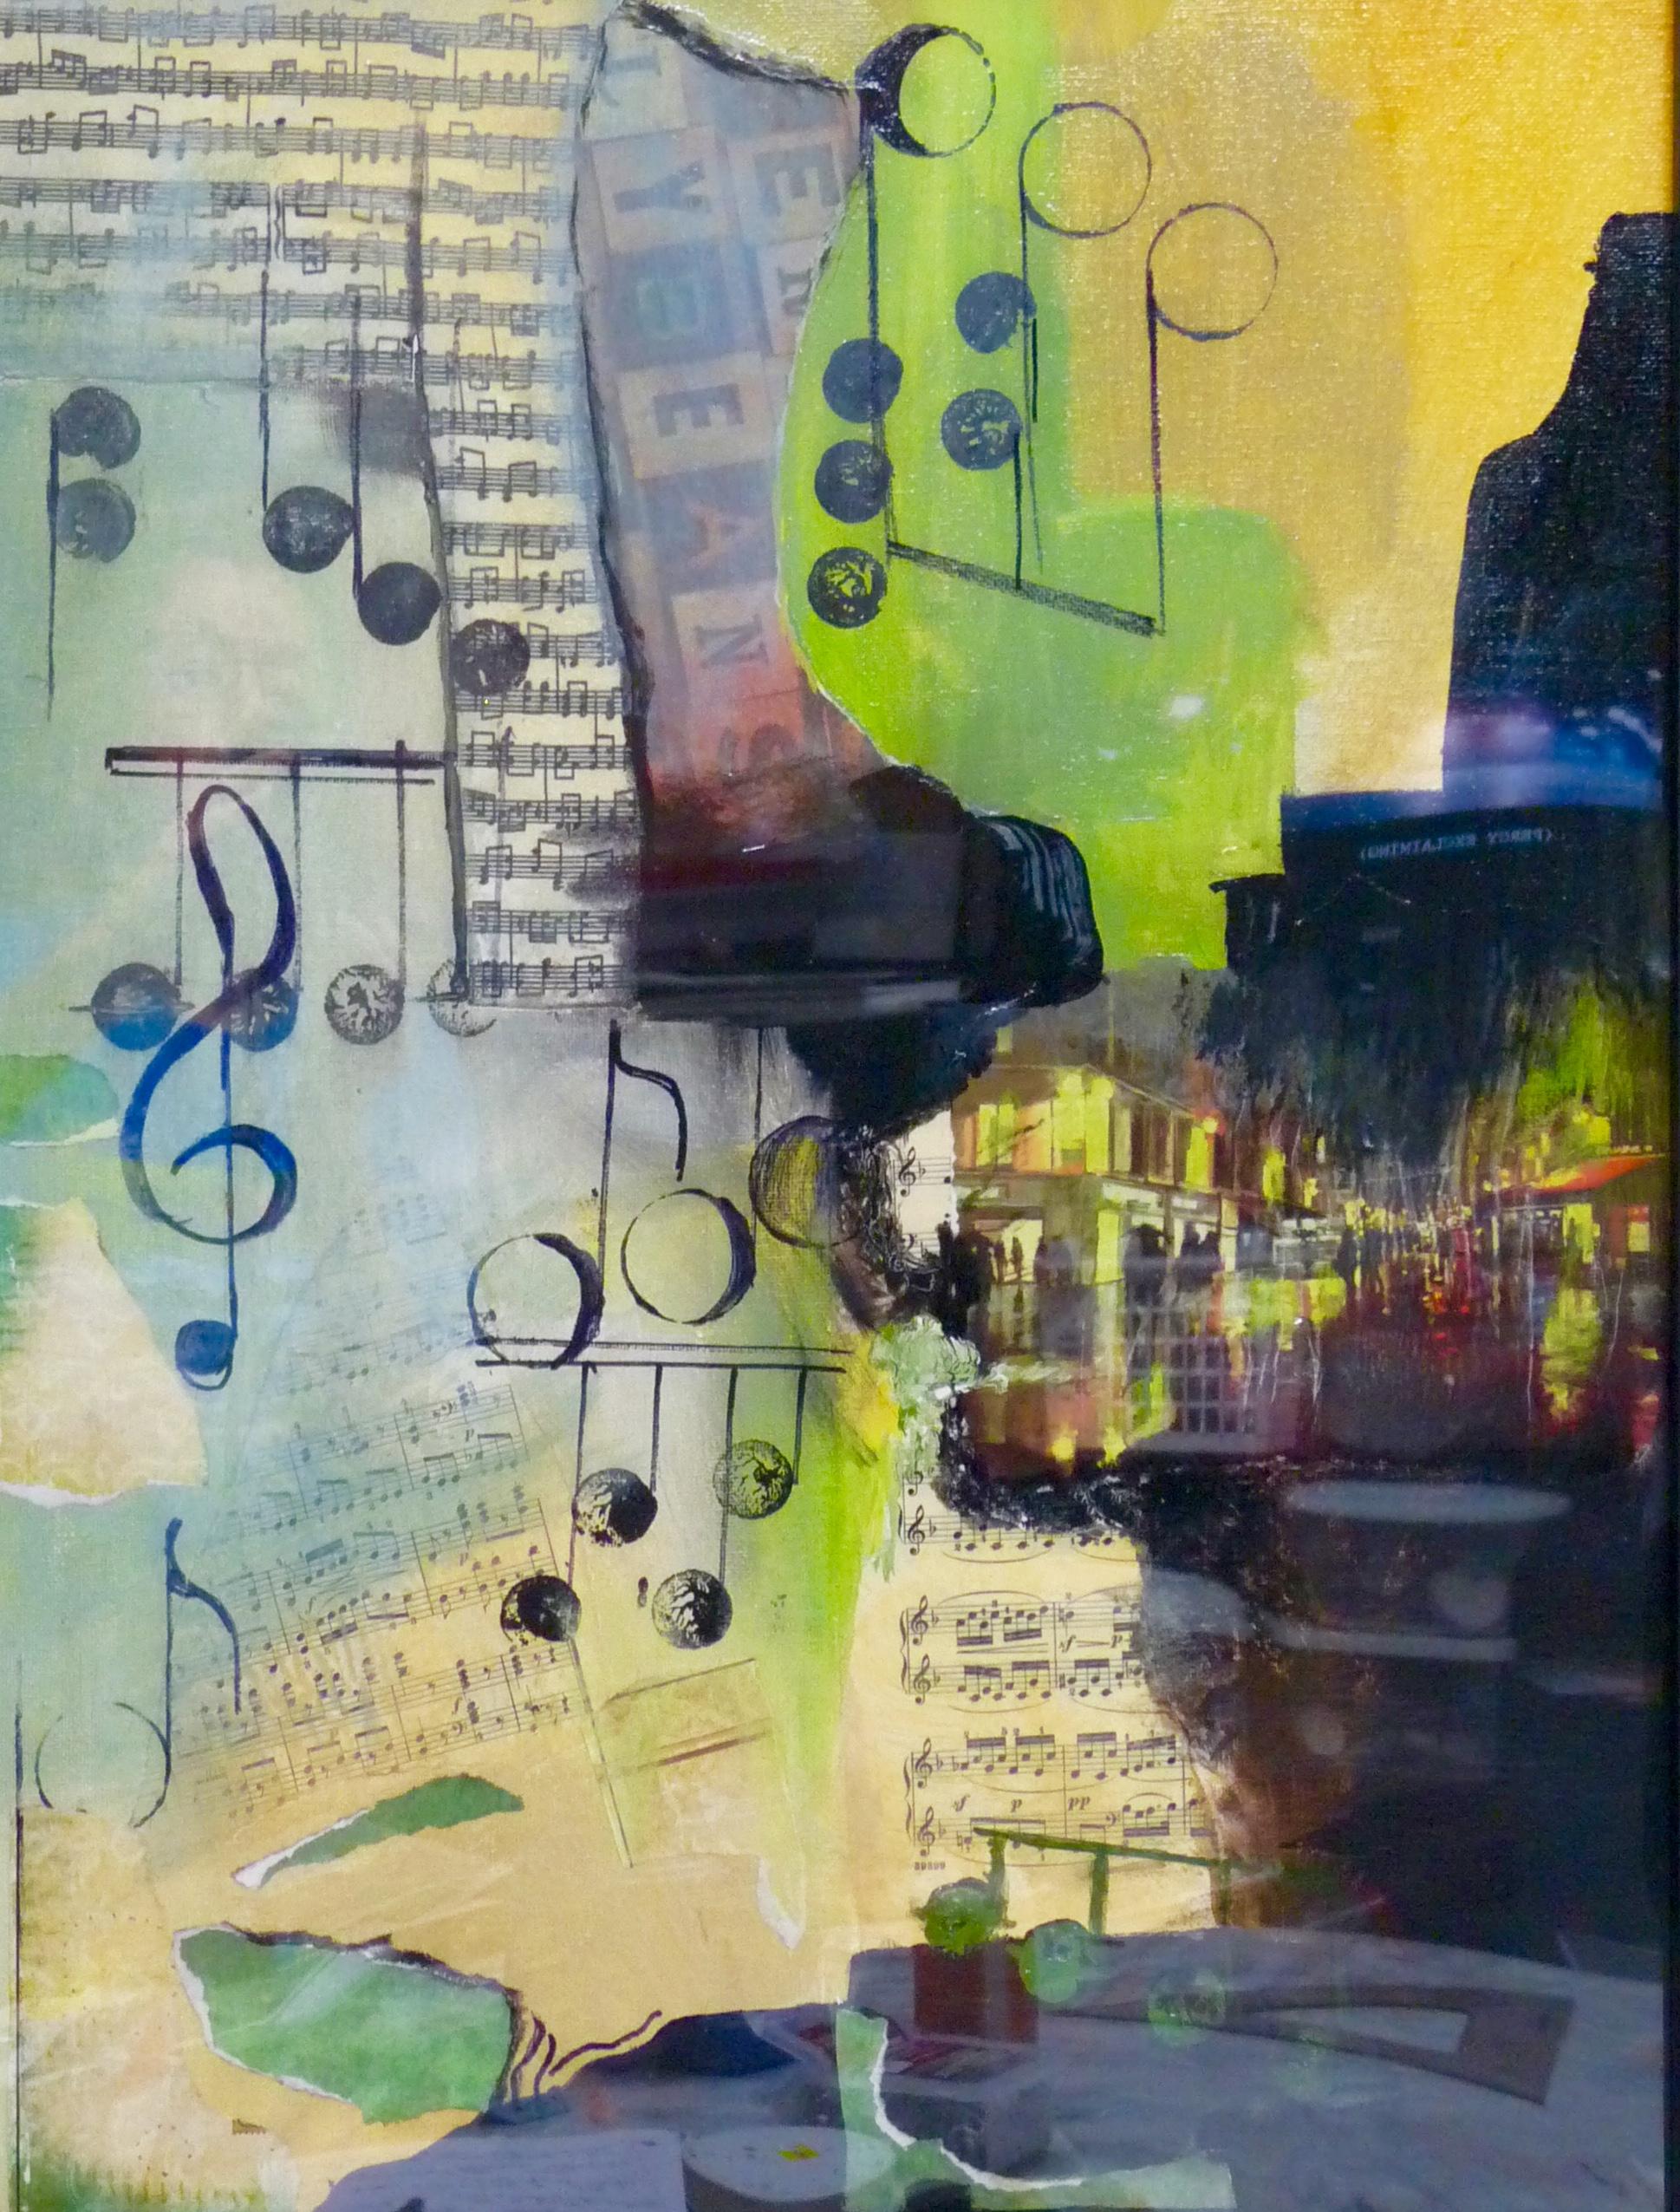 jan-music-on the -street